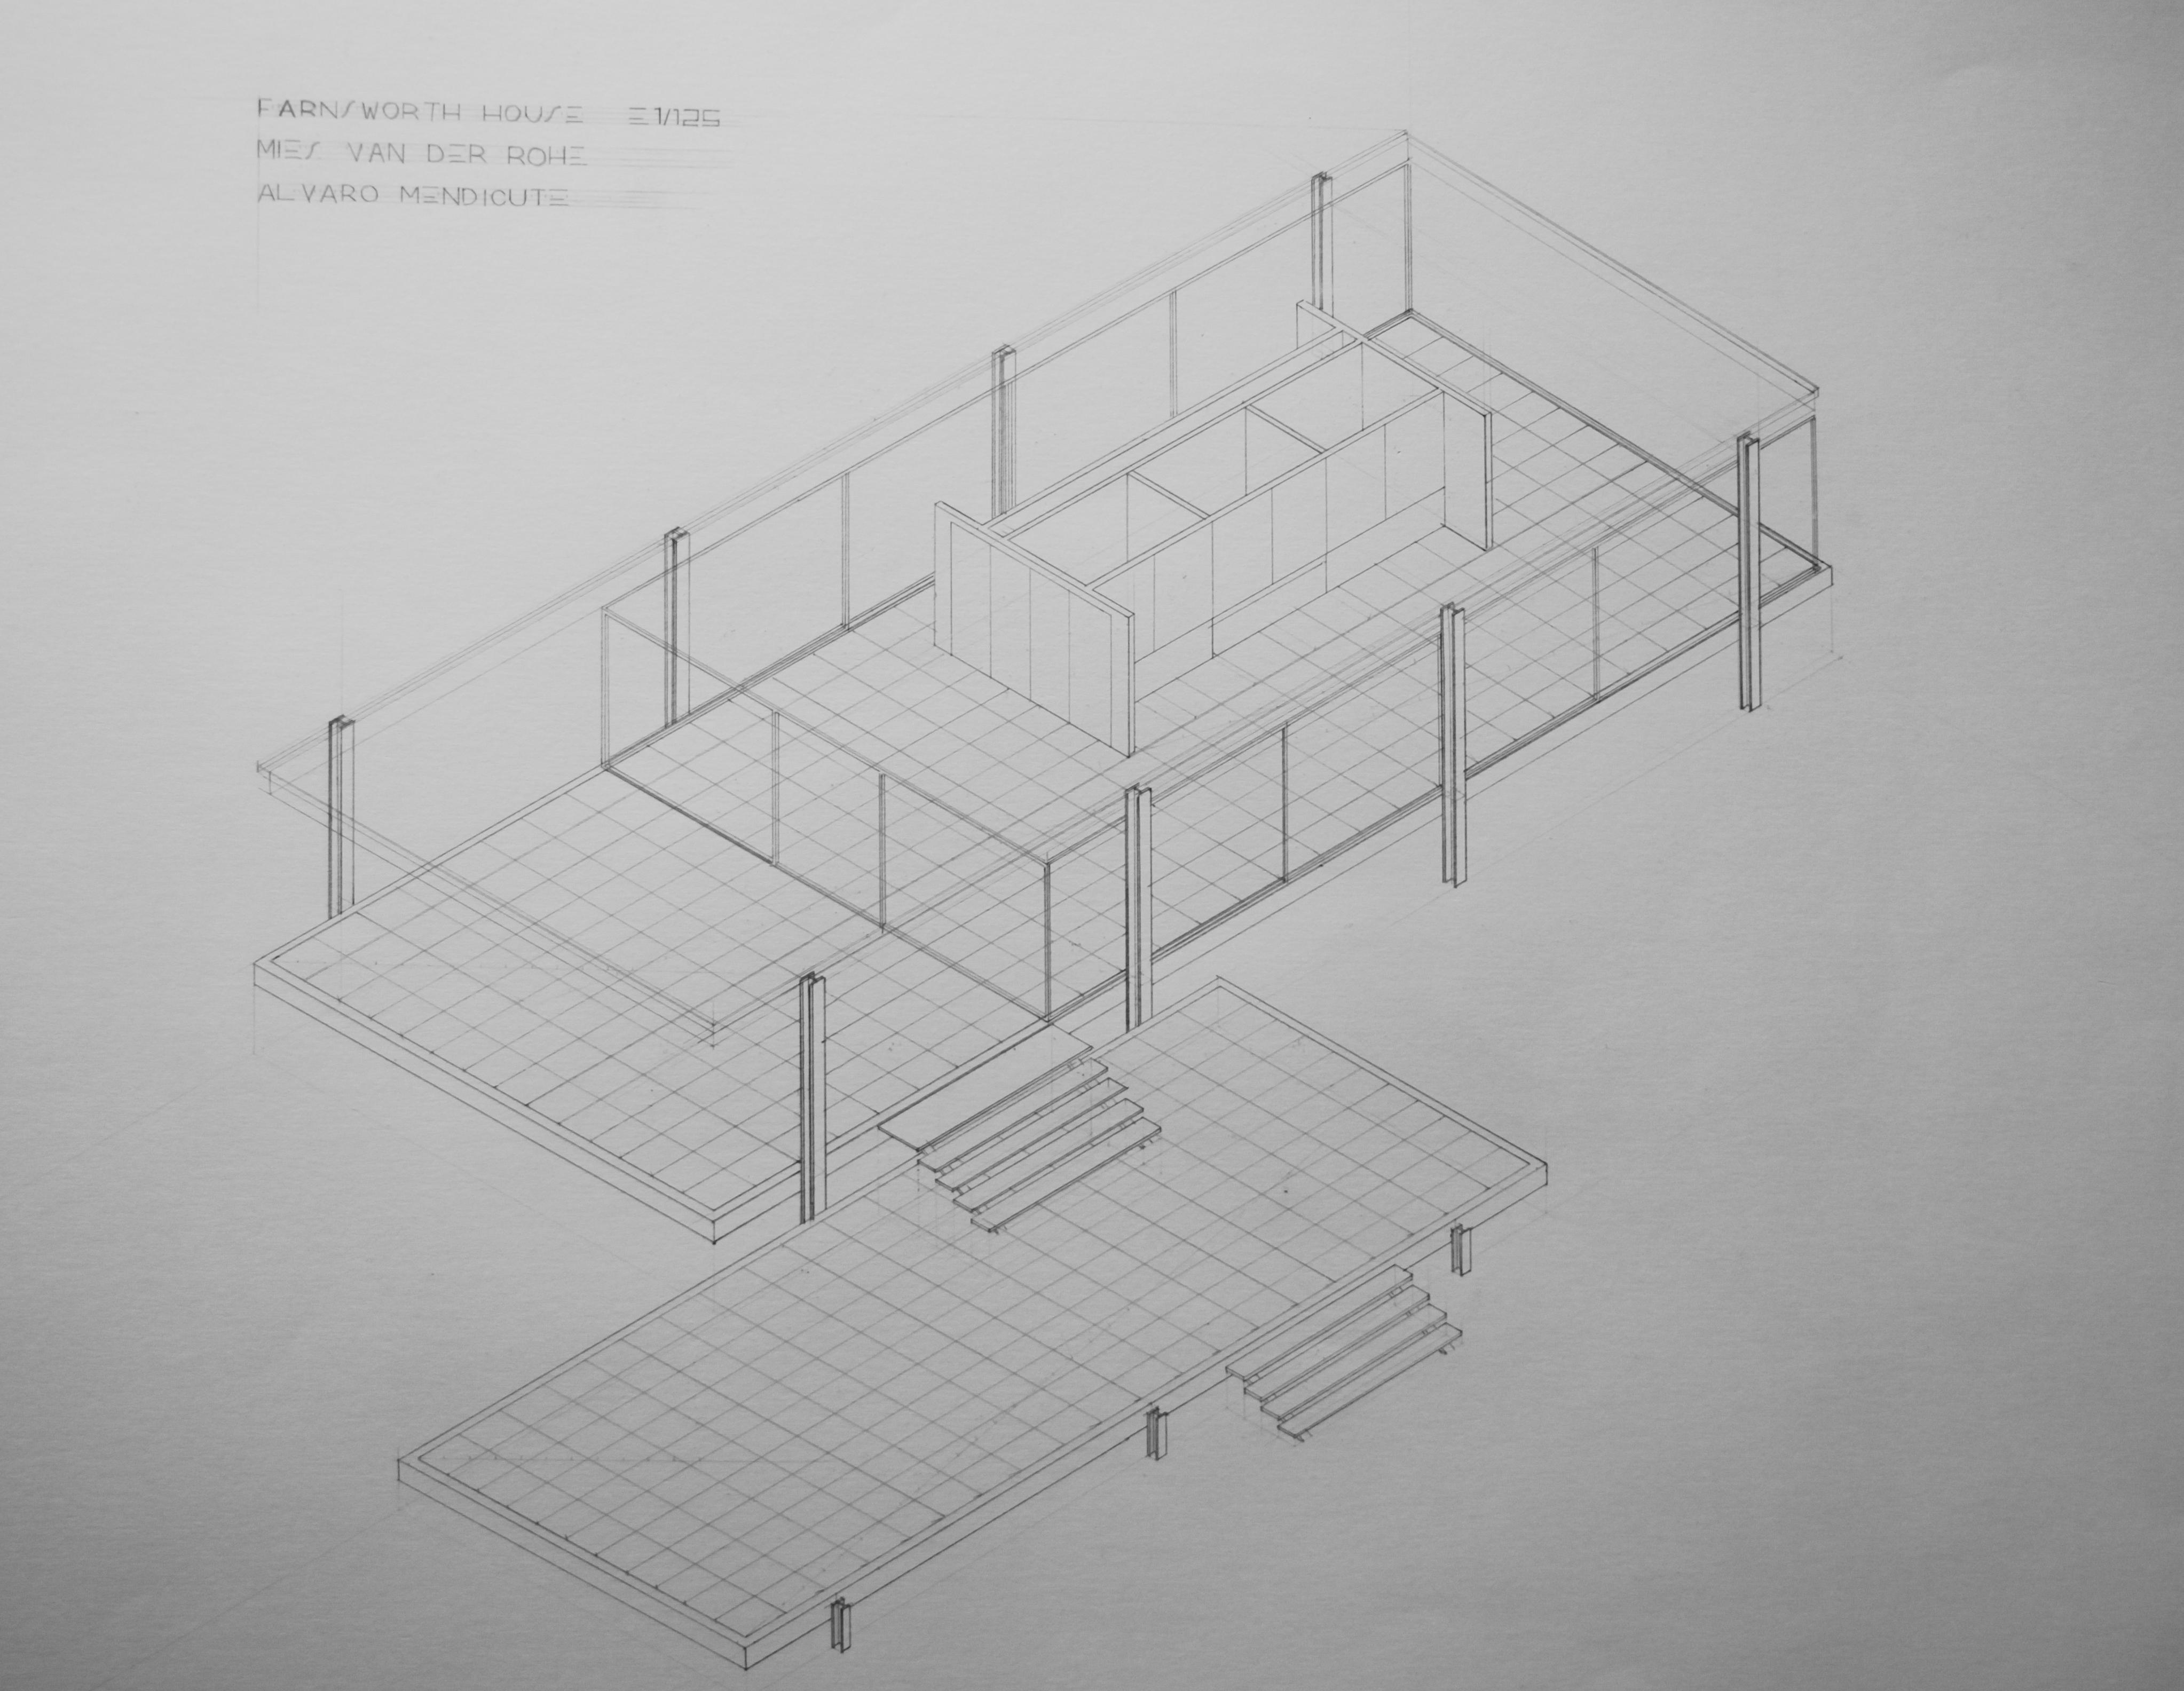 PEC_11 AXONOMTRICO CASA FARNSWORTH MIES VAN DER ROHE  dibujo_arquitectonico_ETSAUN